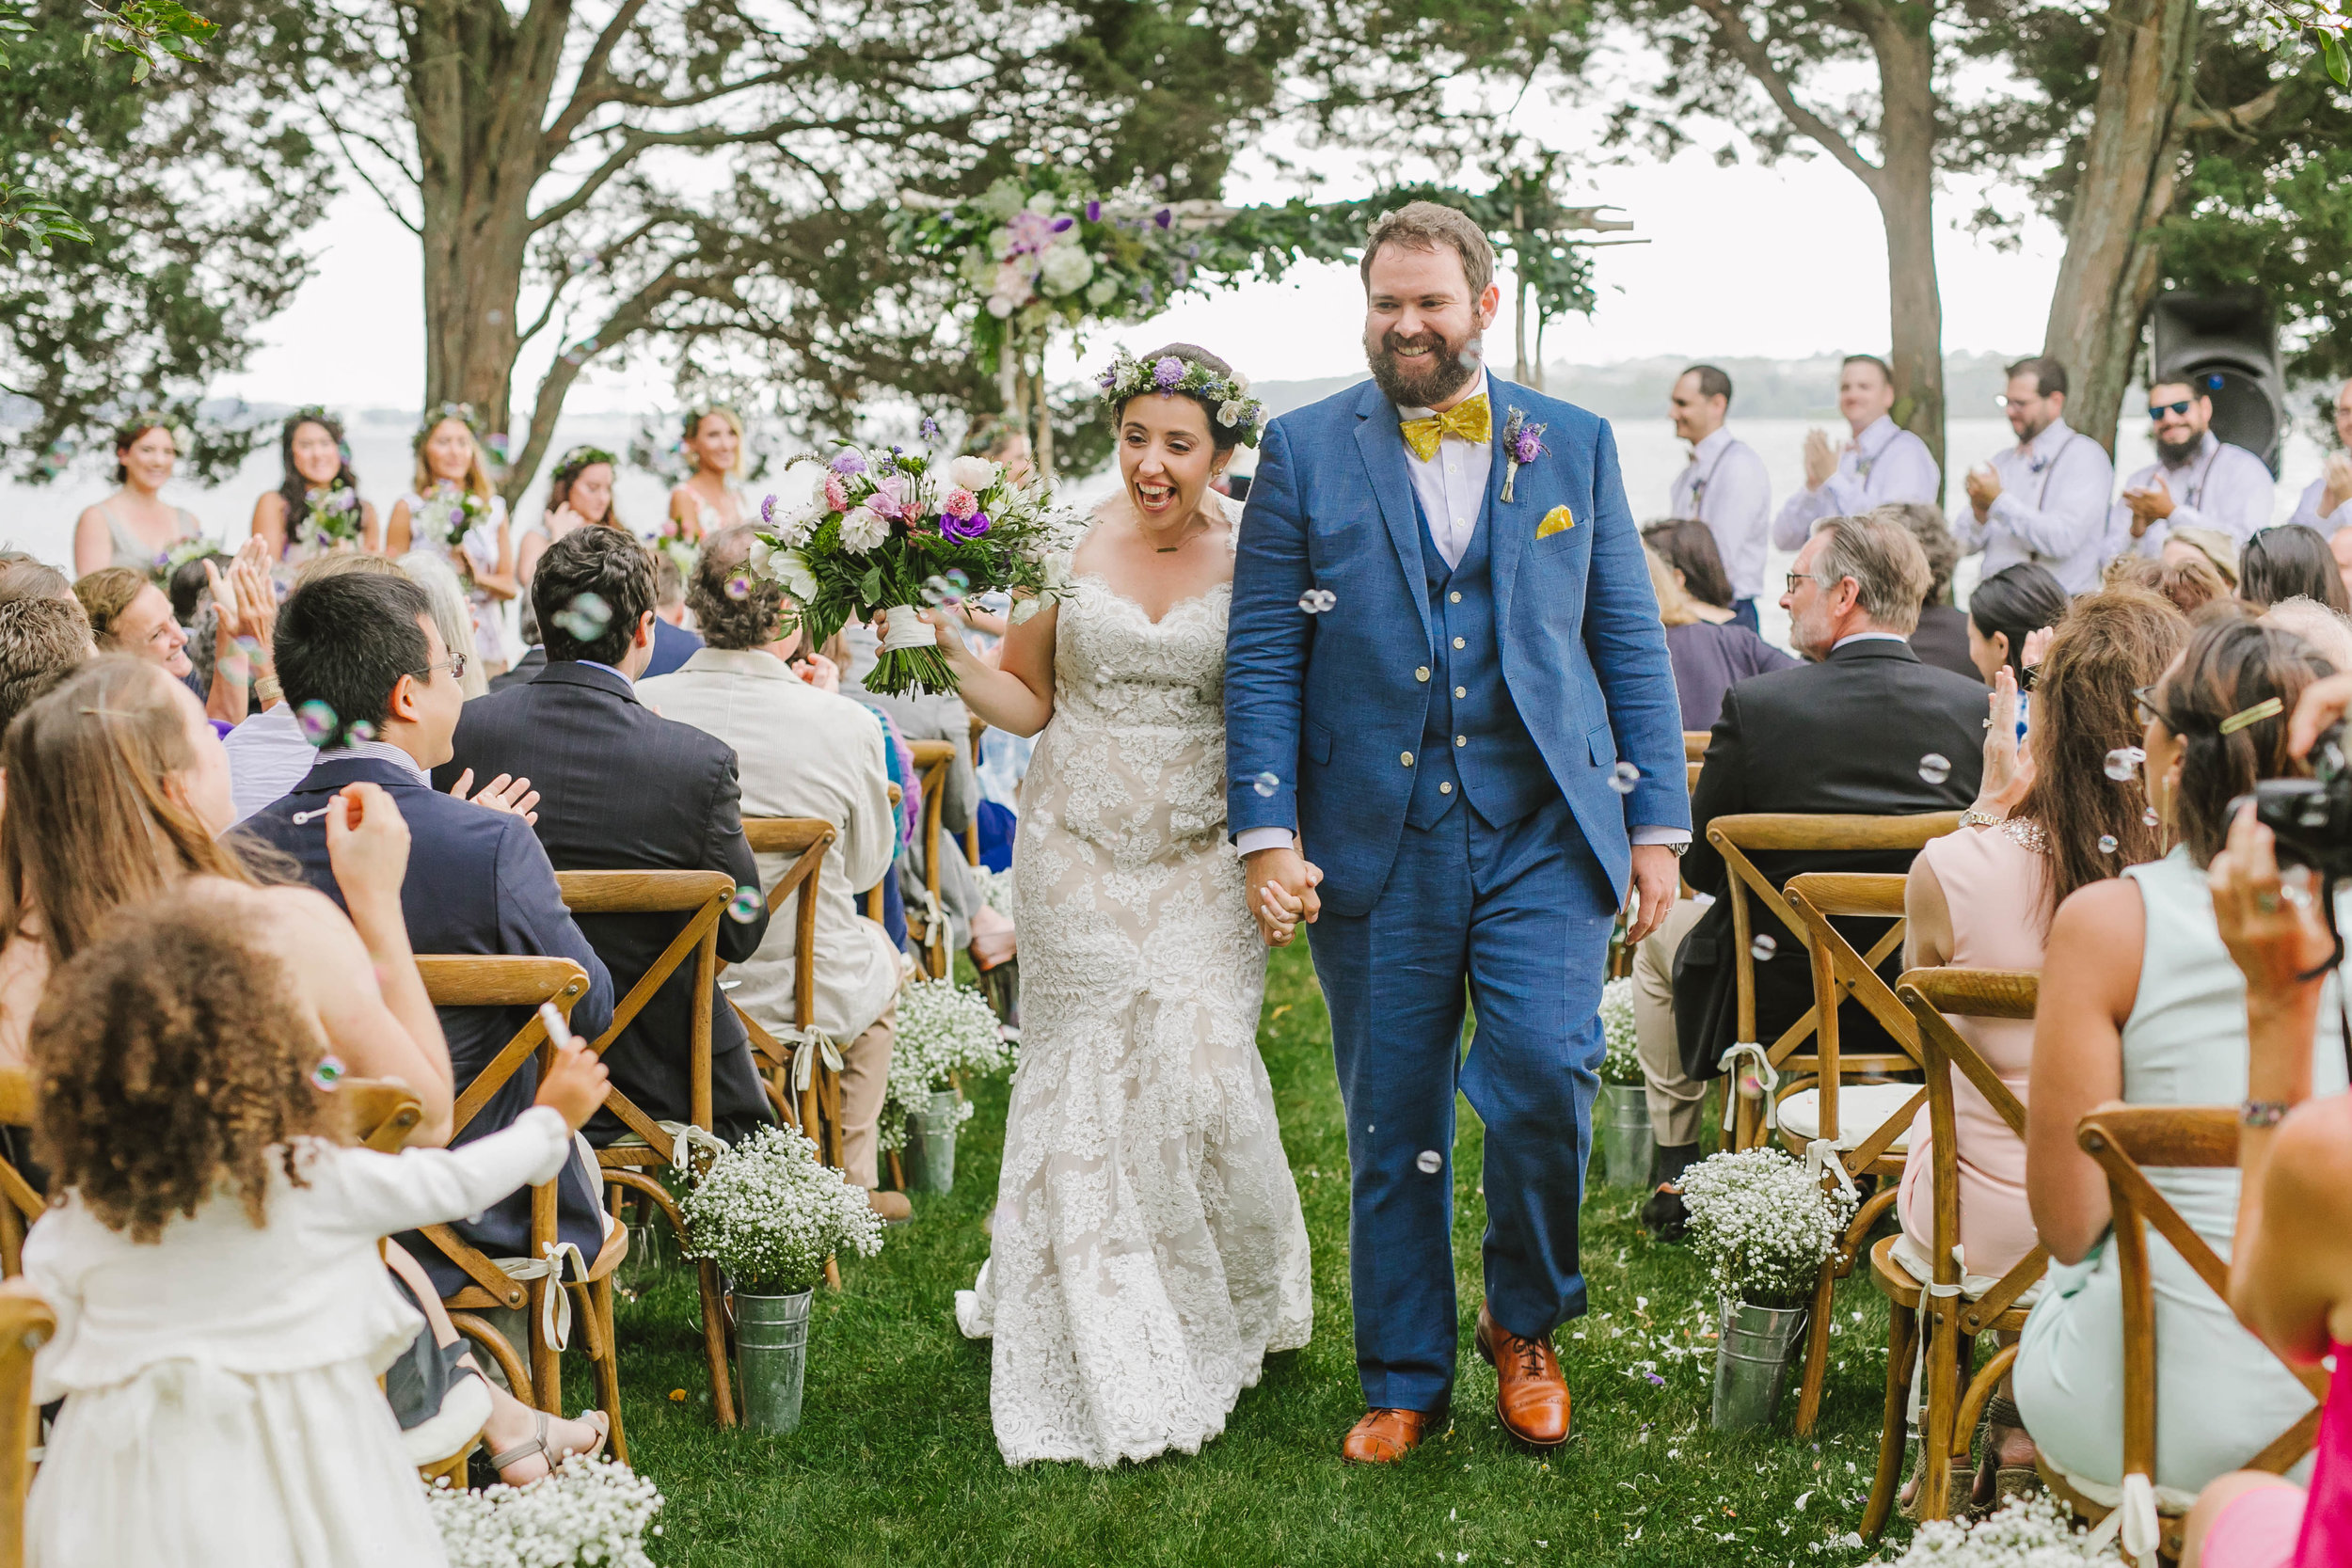 Mount Hope Farm Bristol Rhode Island RI New England Coastal Flower Crown Wedding - Emily Tebbetts Photography-12.jpg